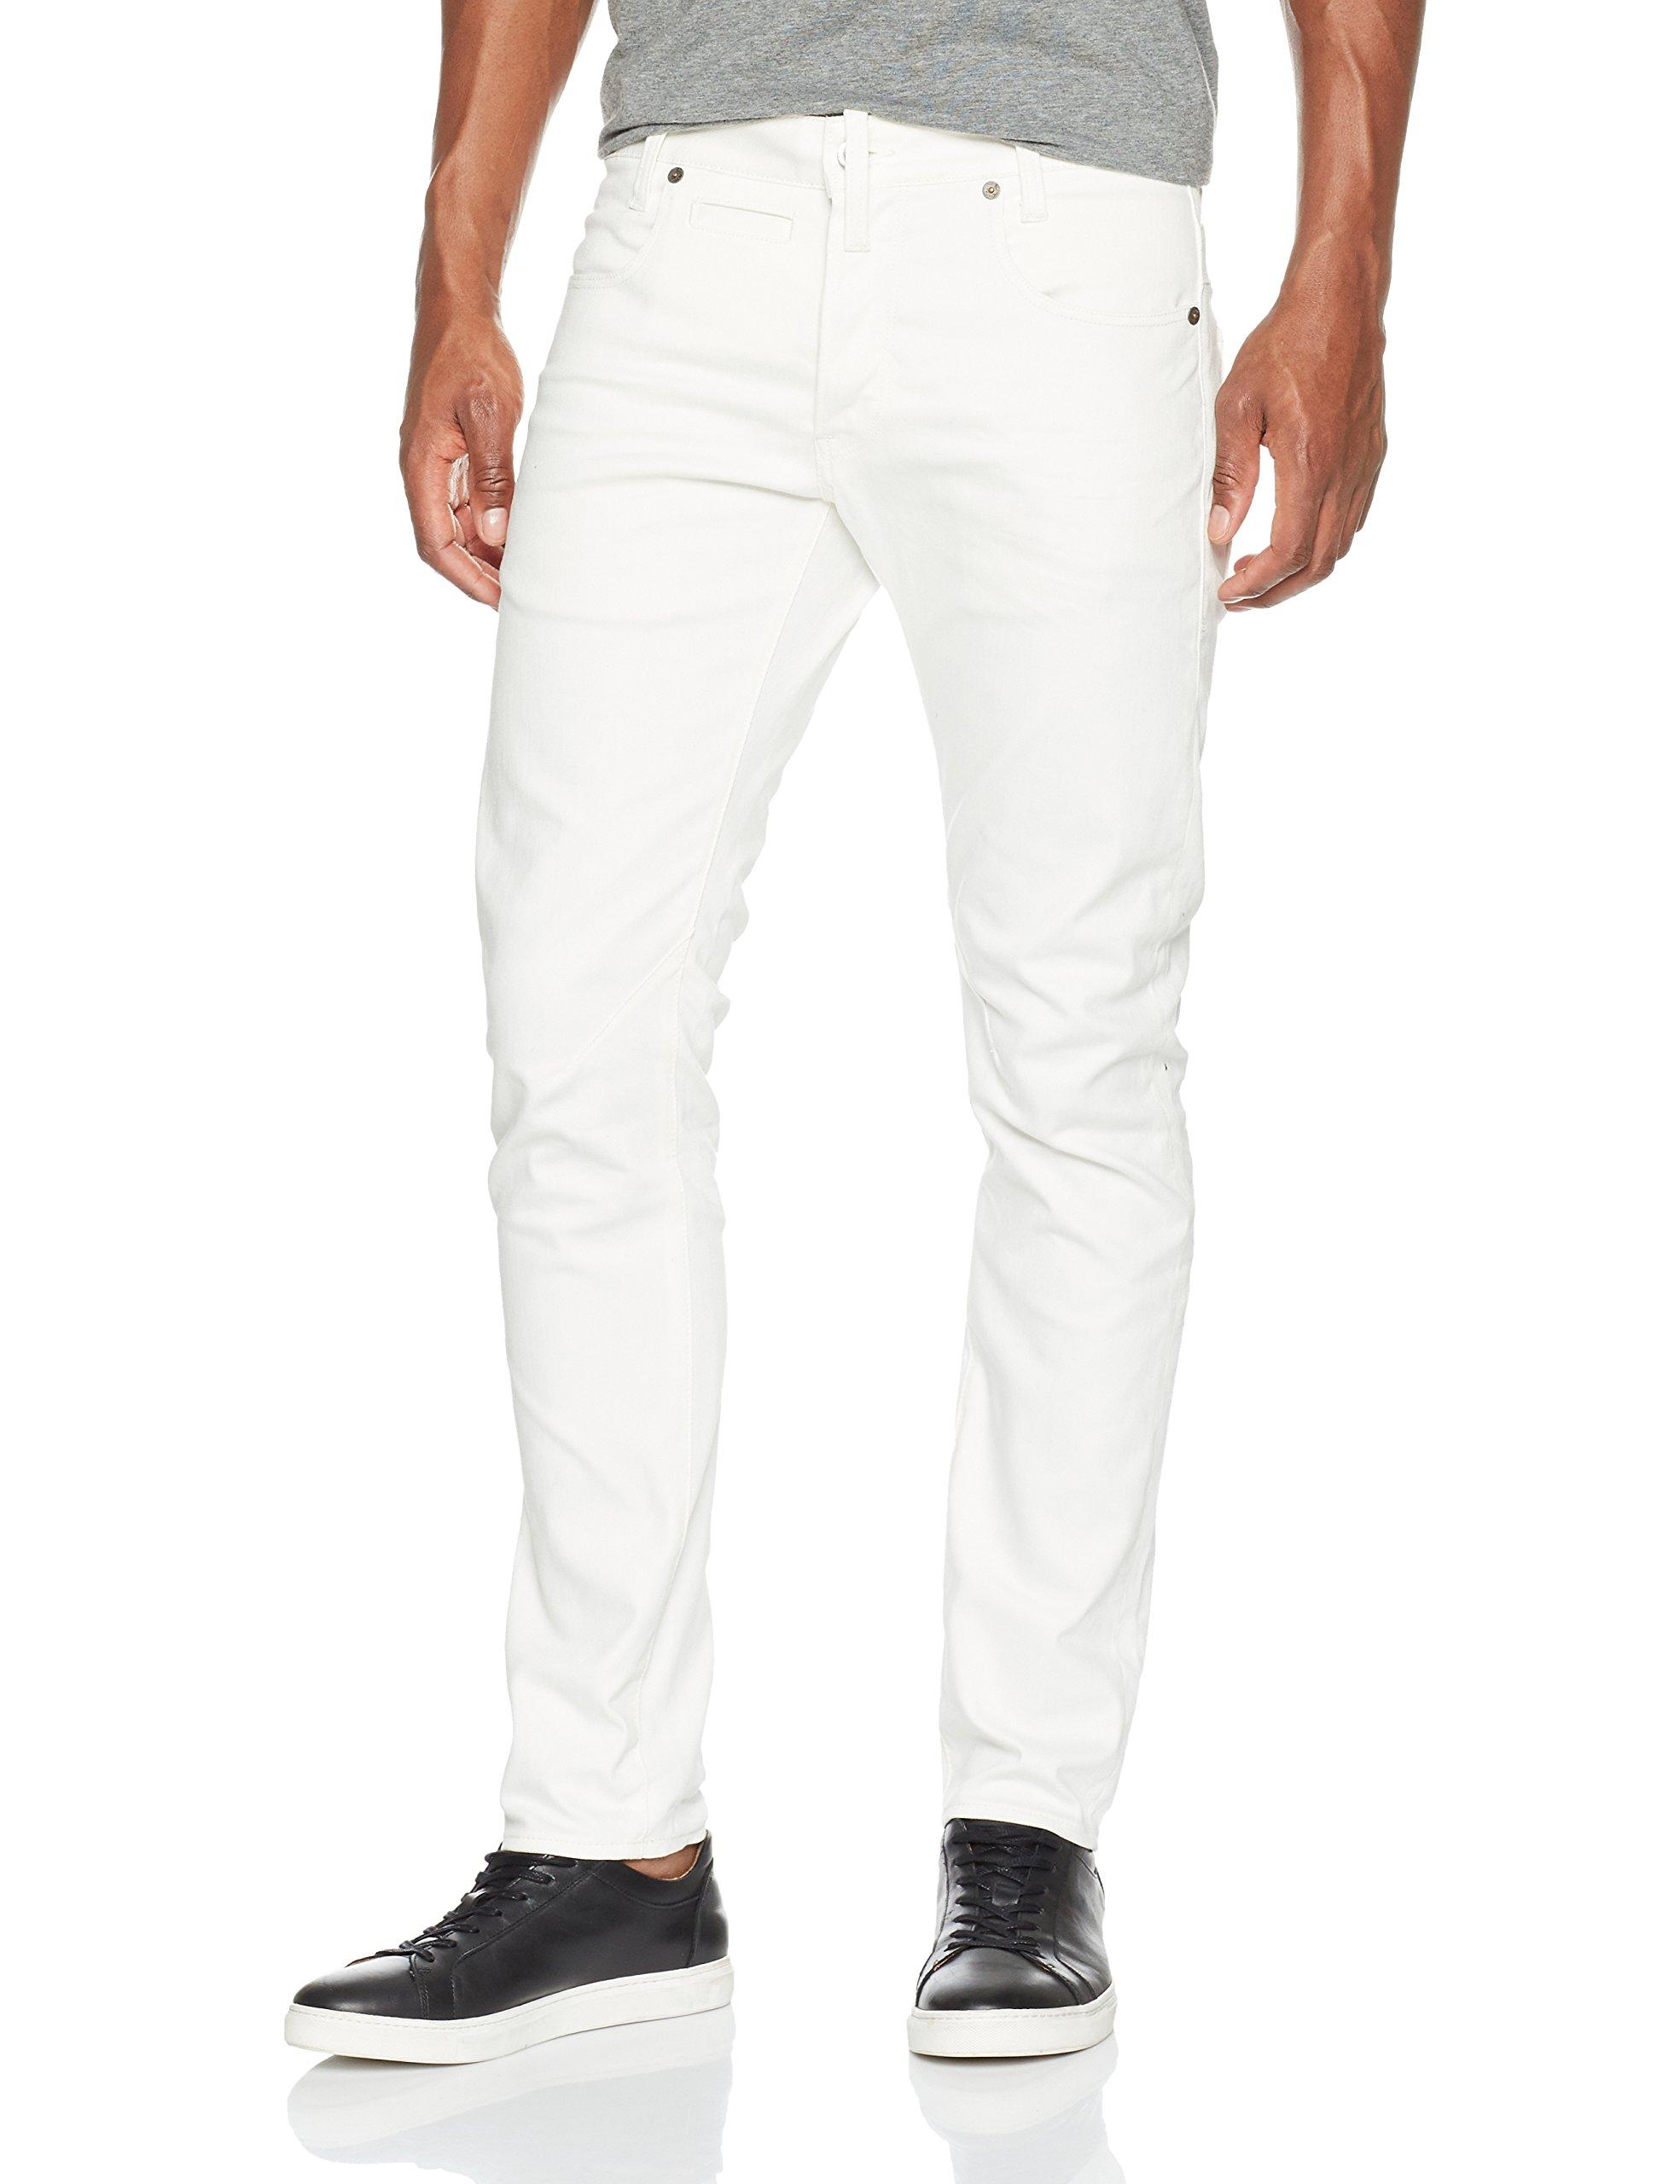 star Raw DStaq Denim 124134w30l Slim 5 JeansBlanc3d Homme pocket G 6729 xrWCdoBe